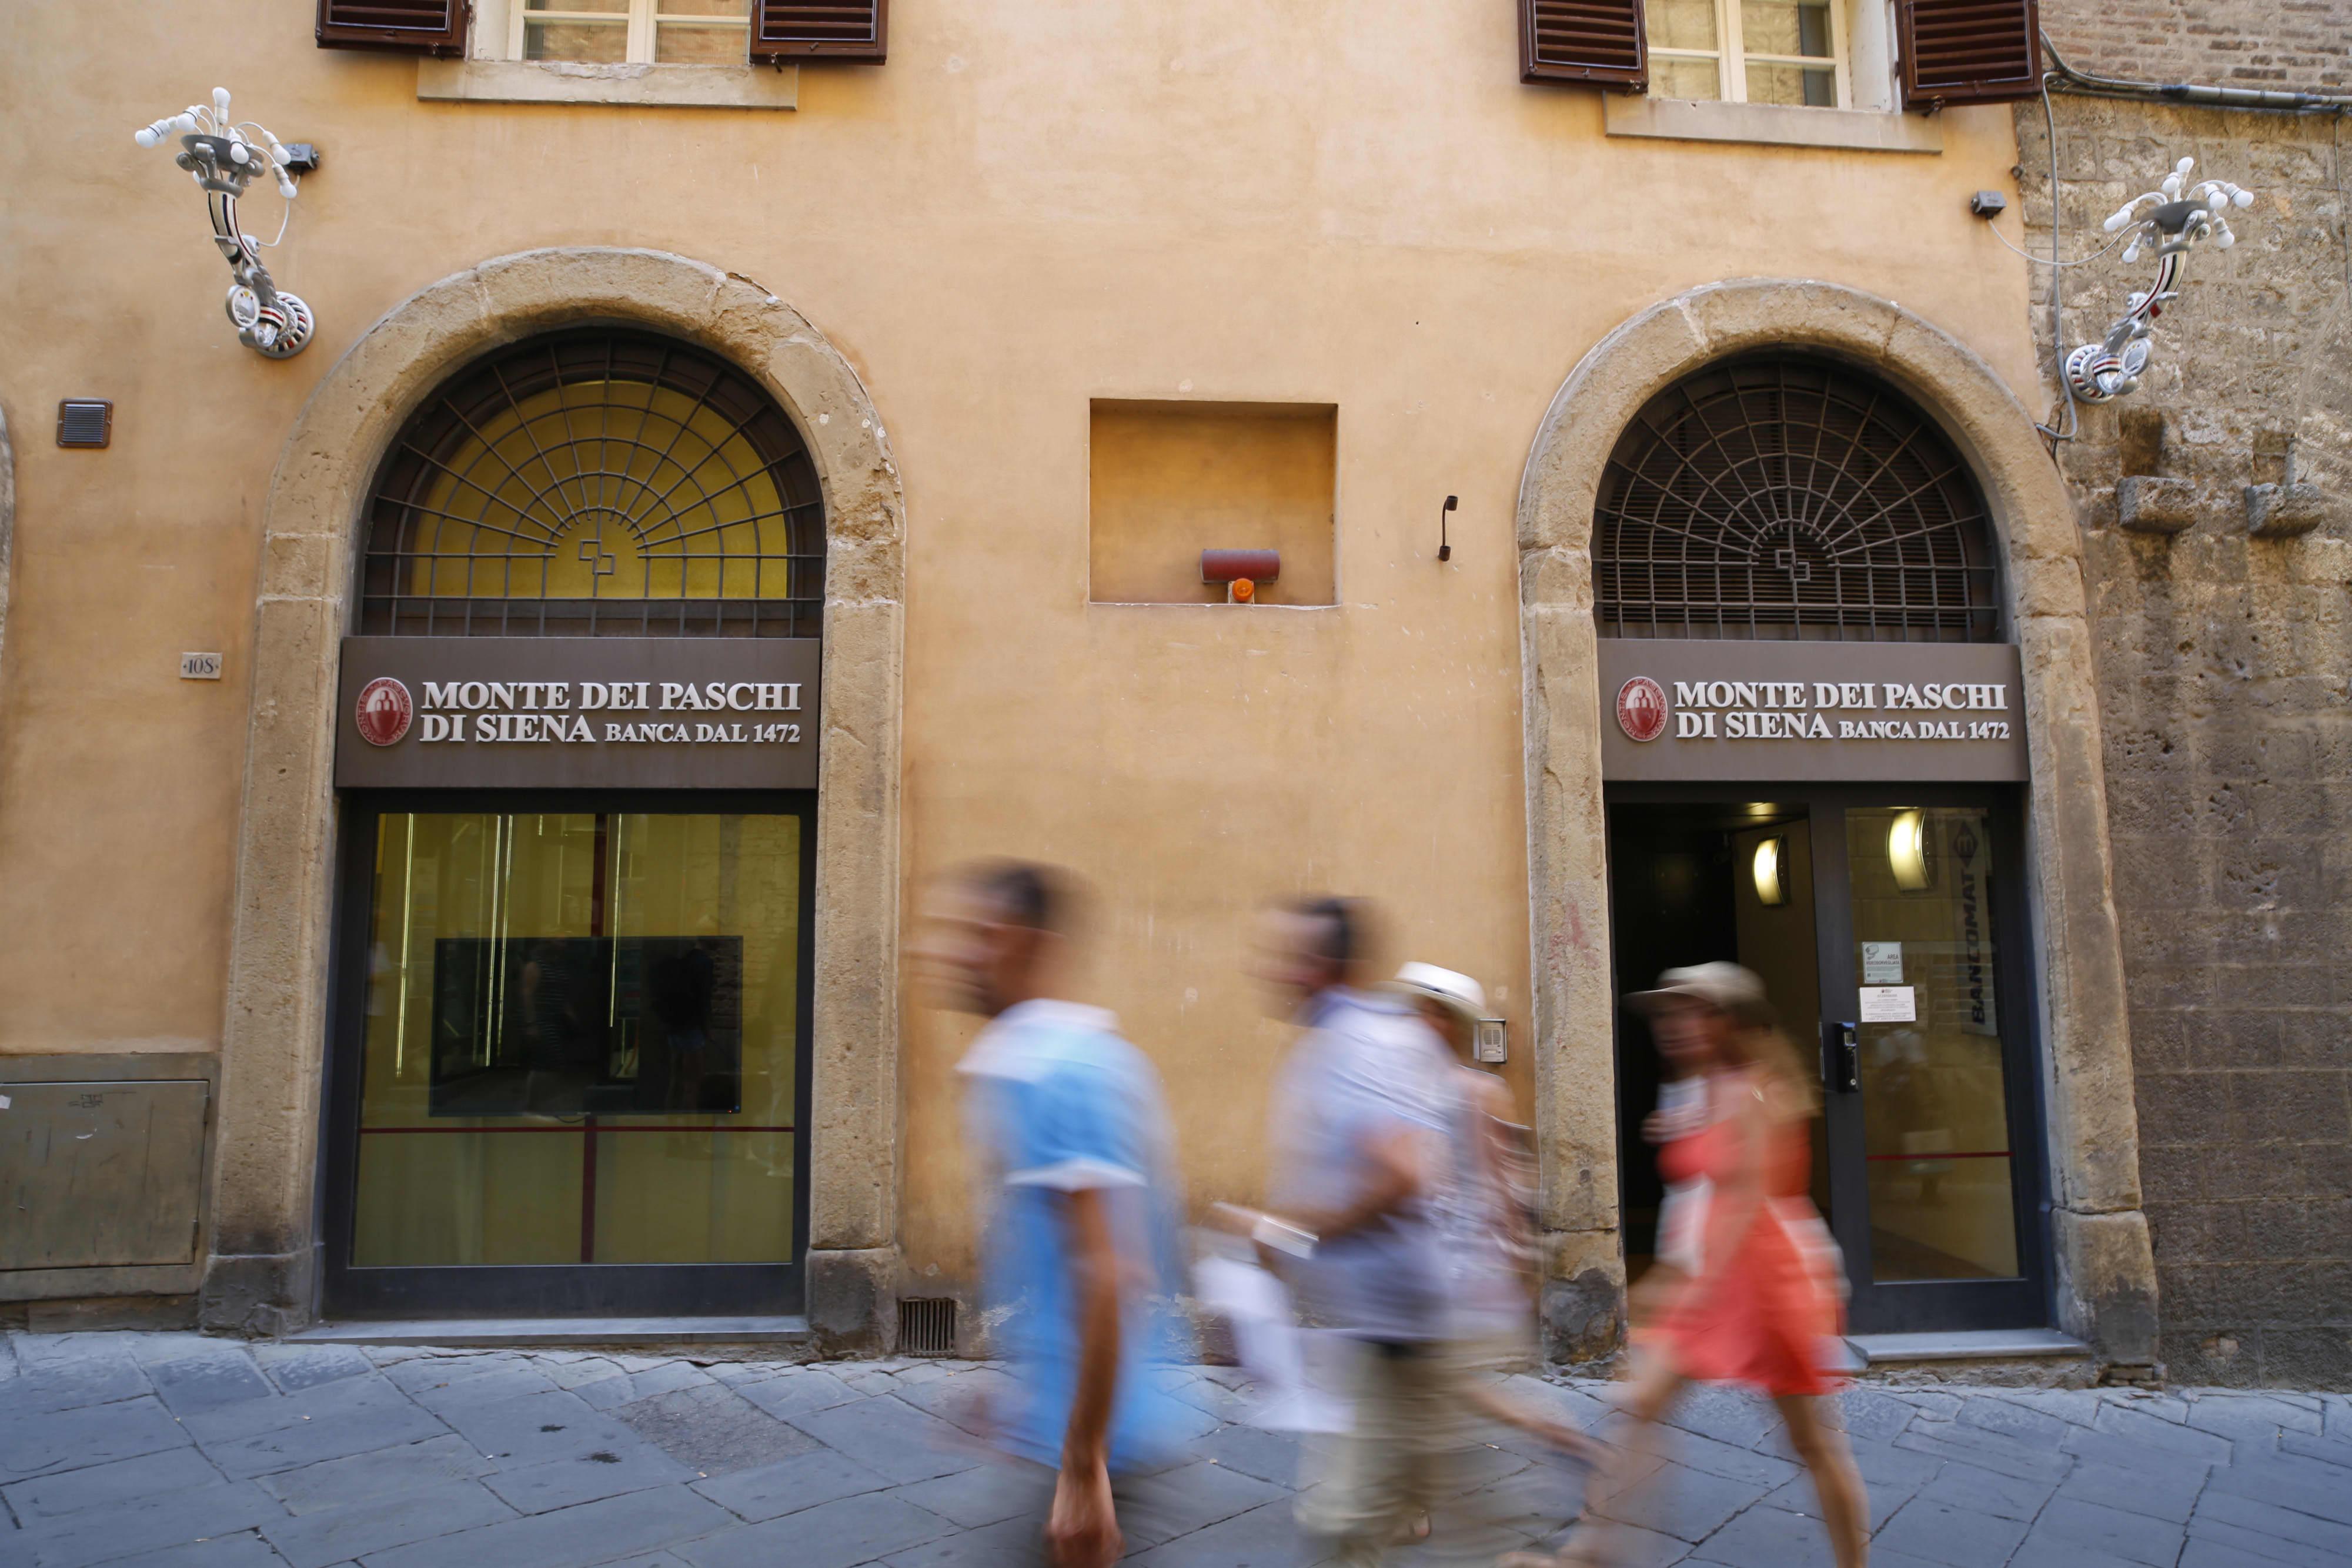 Pedestrians pass by a Banca Monte dei Paschi di Siena bank branch in Siena, Italy.